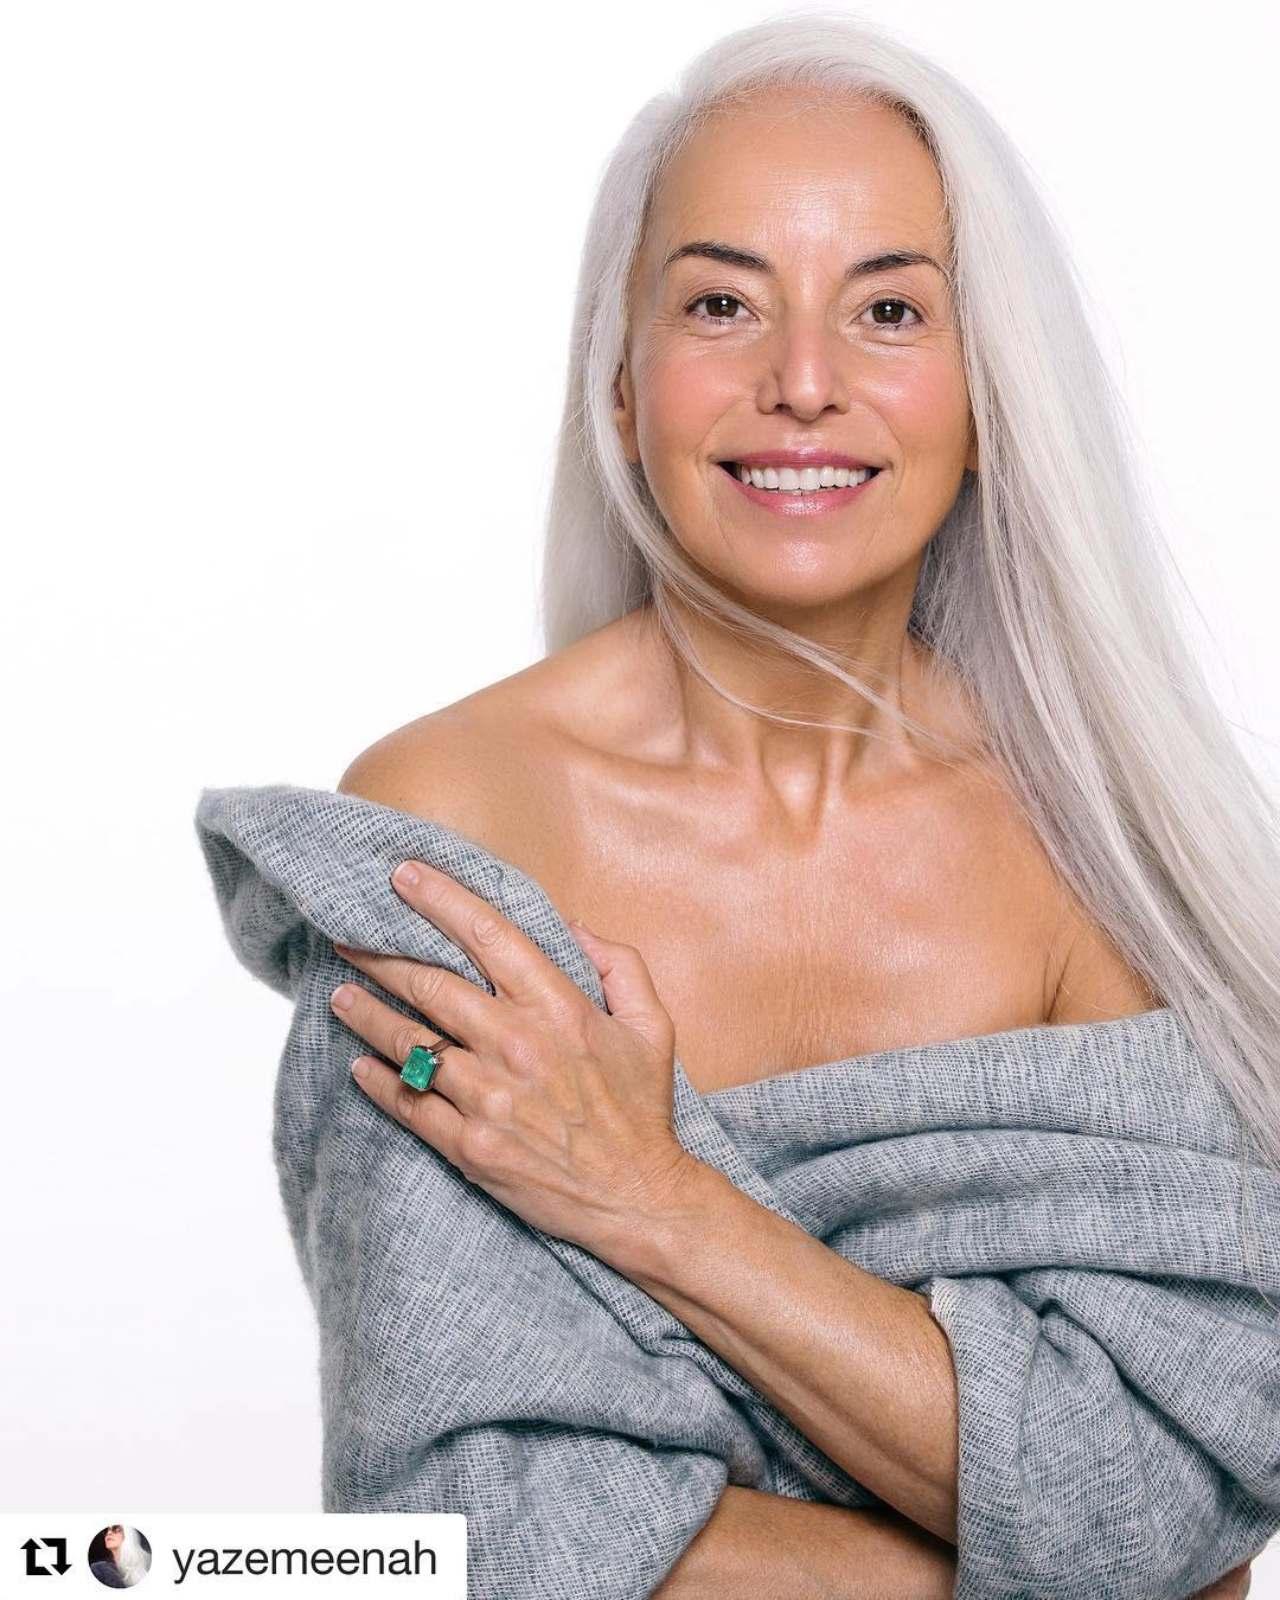 Yazemeenah Rossi abuela 60 anos joven